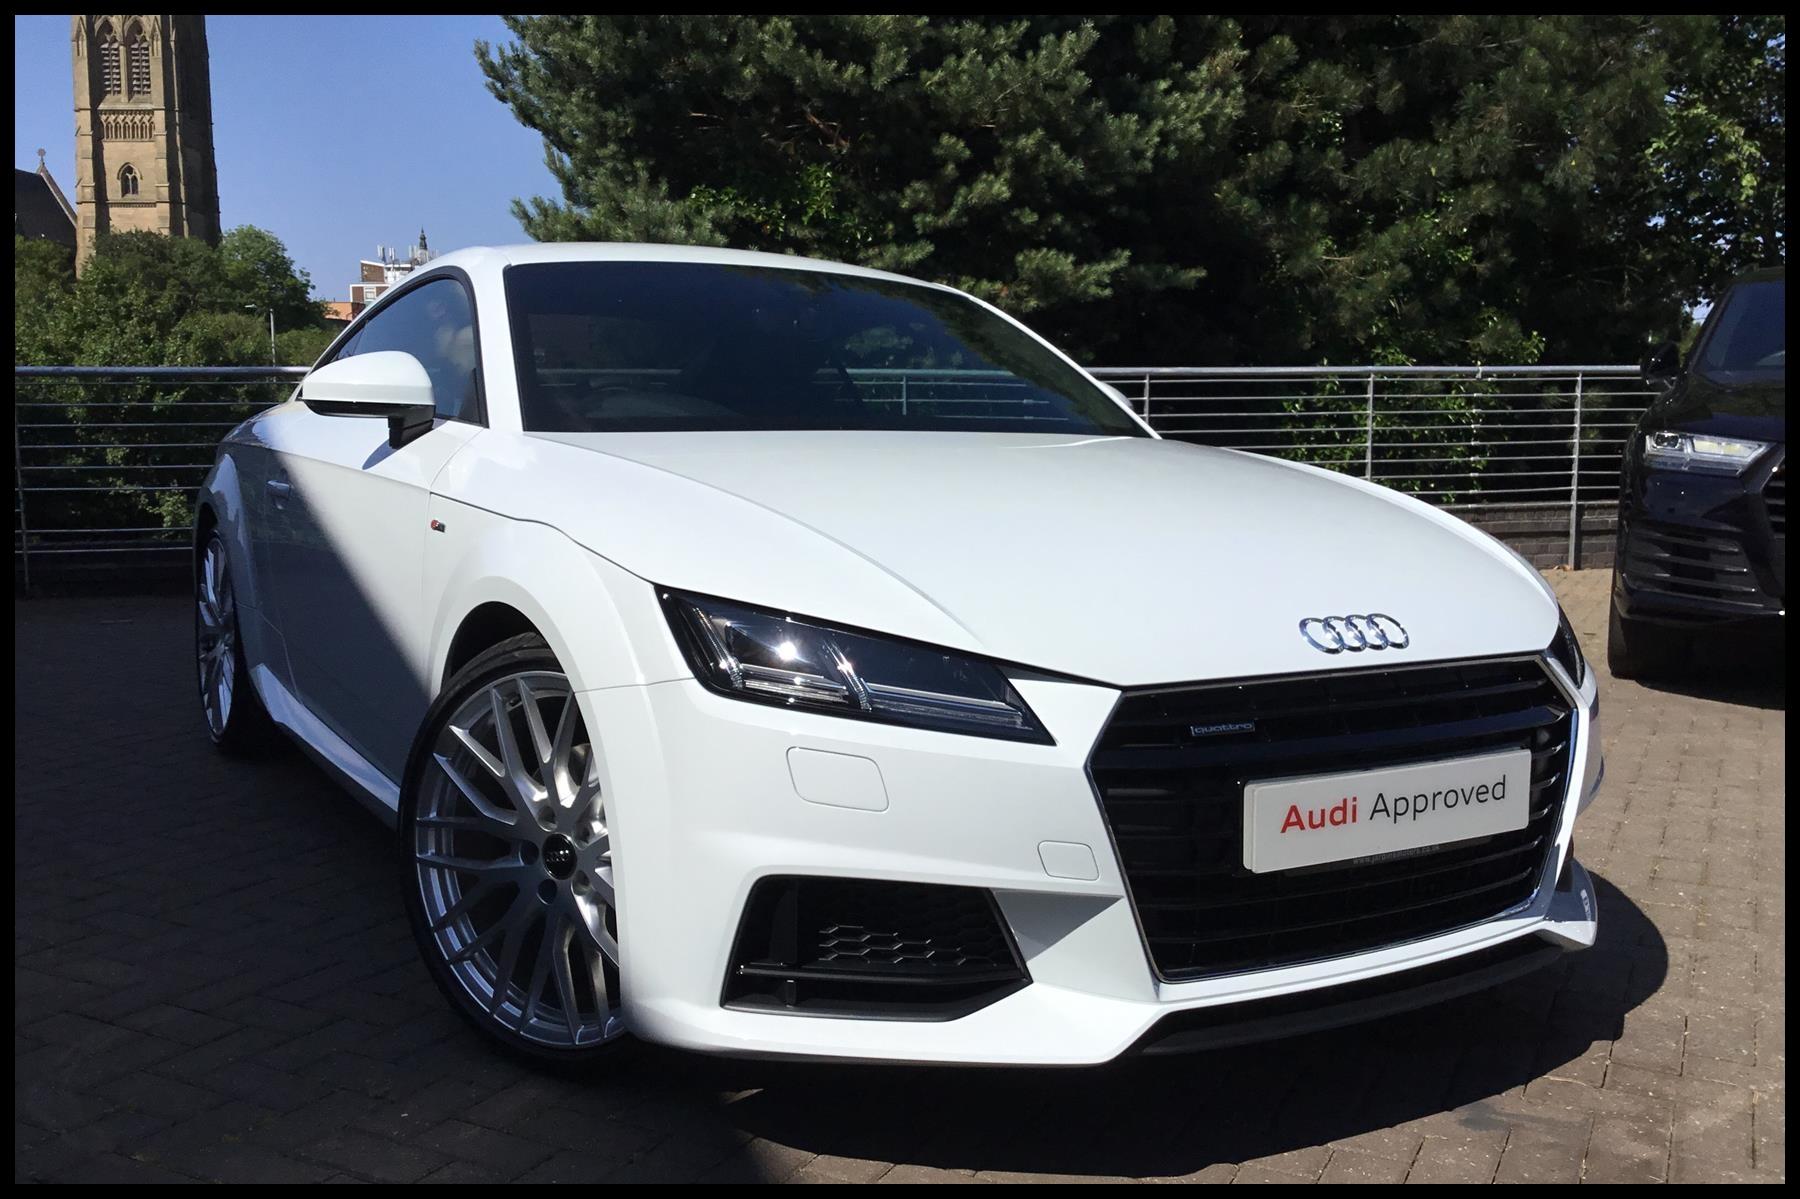 Audi TT Coup S line 2 0 TFSI quattro 230 PS S tronic 2018